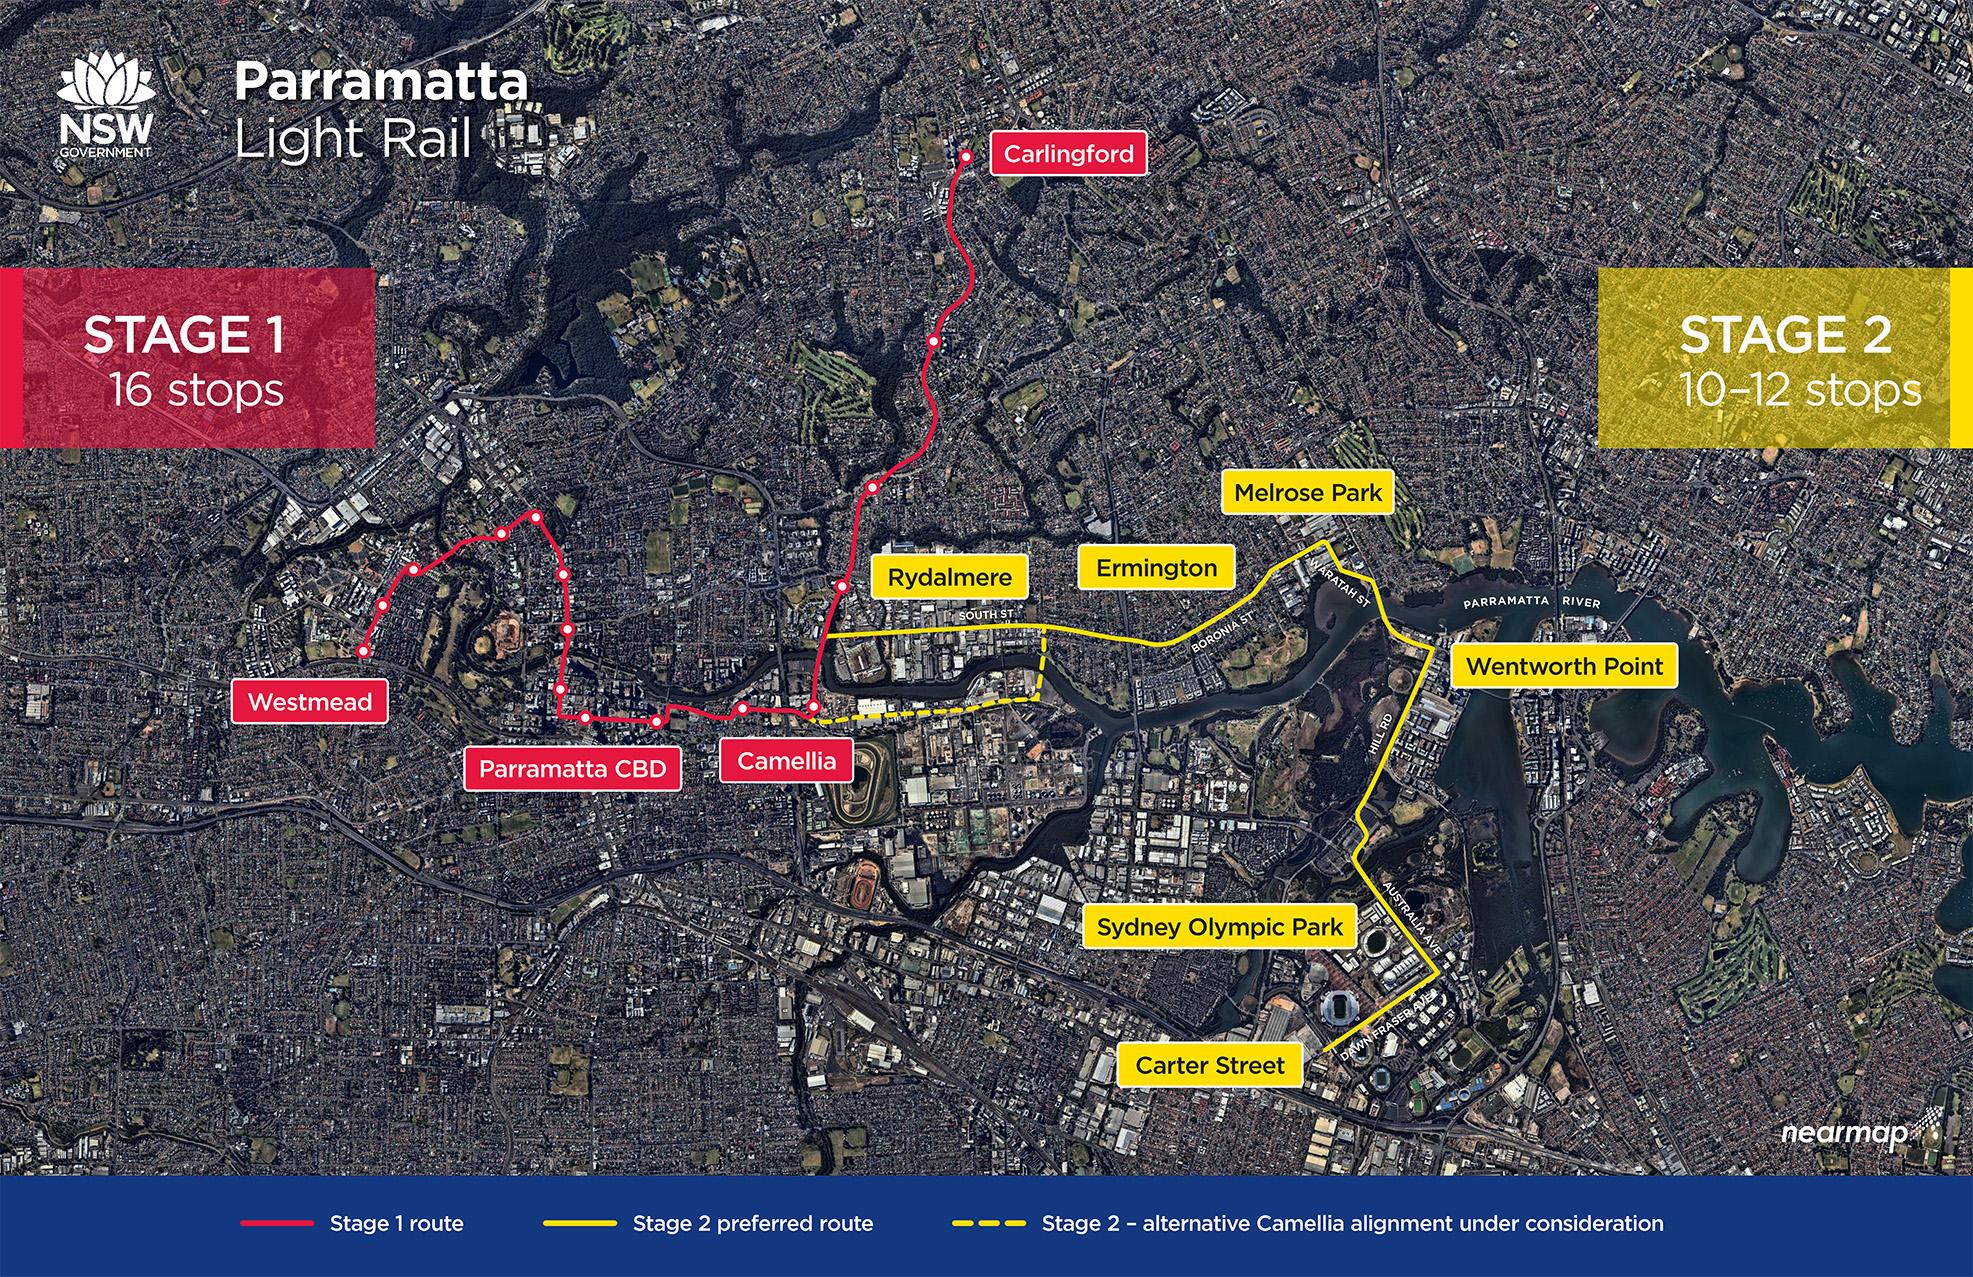 Parramatta Light Rail Stage 2 map